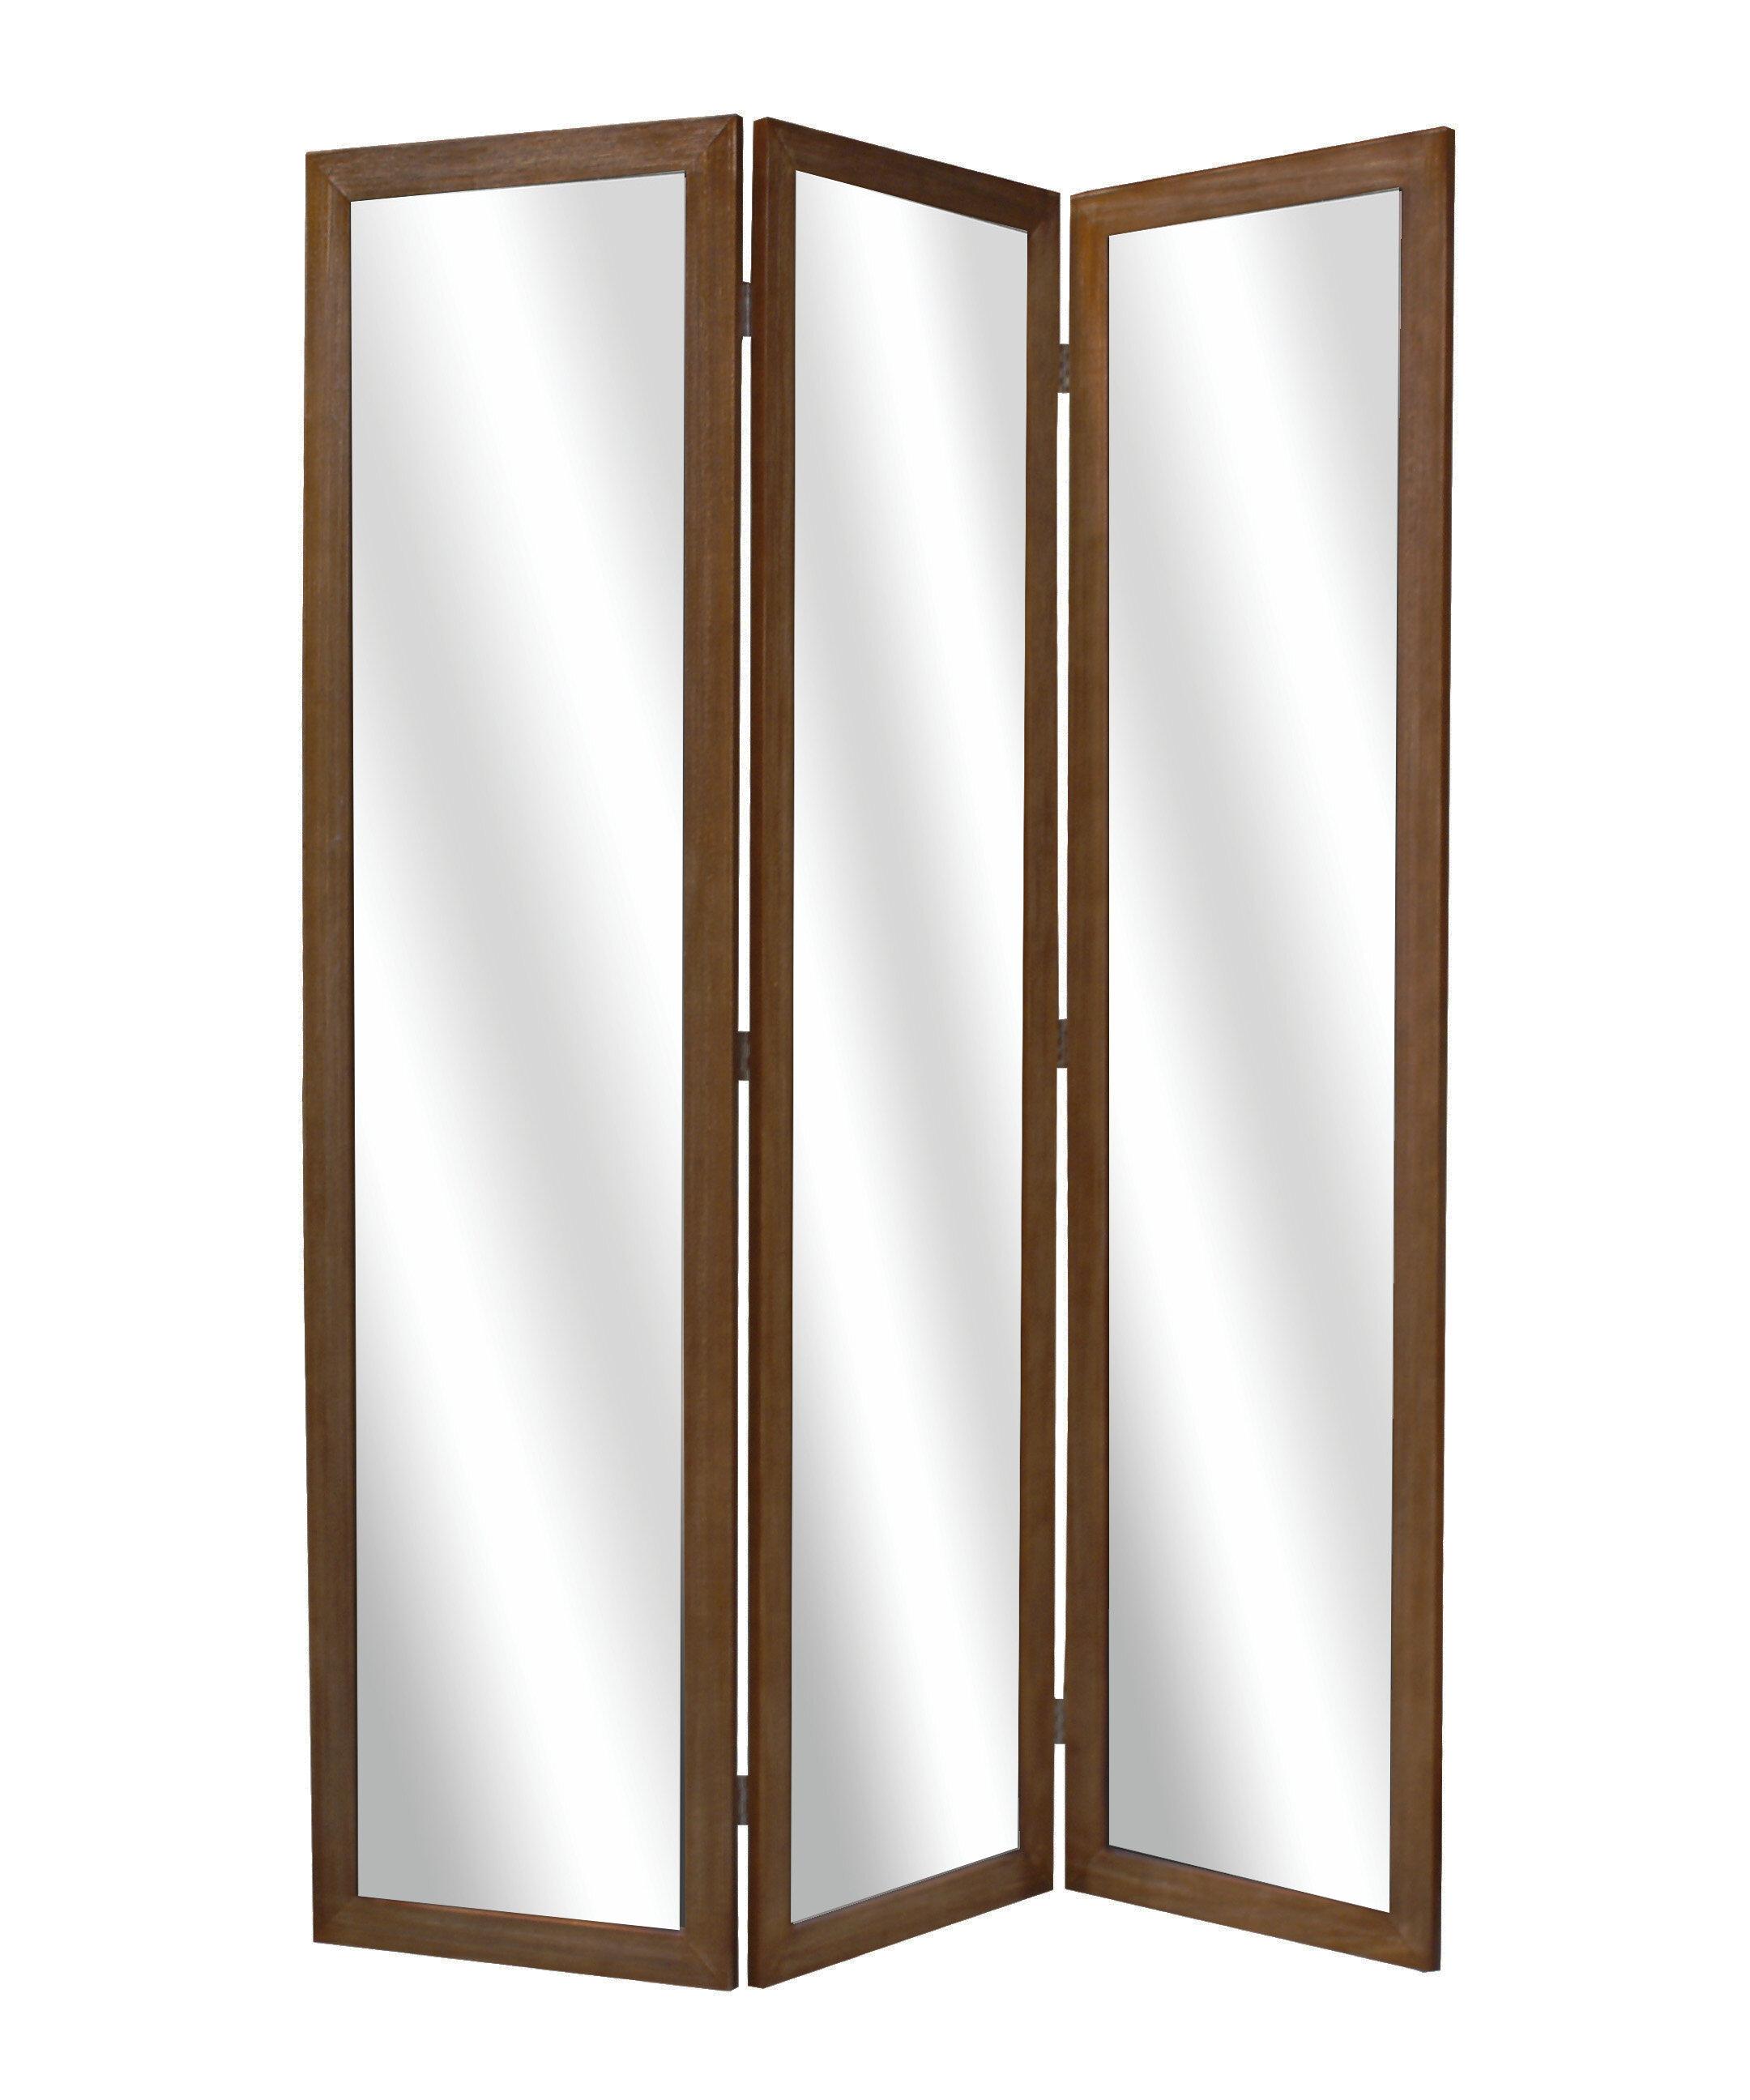 Screen gems binini mirror 3 panel room divider wayfair